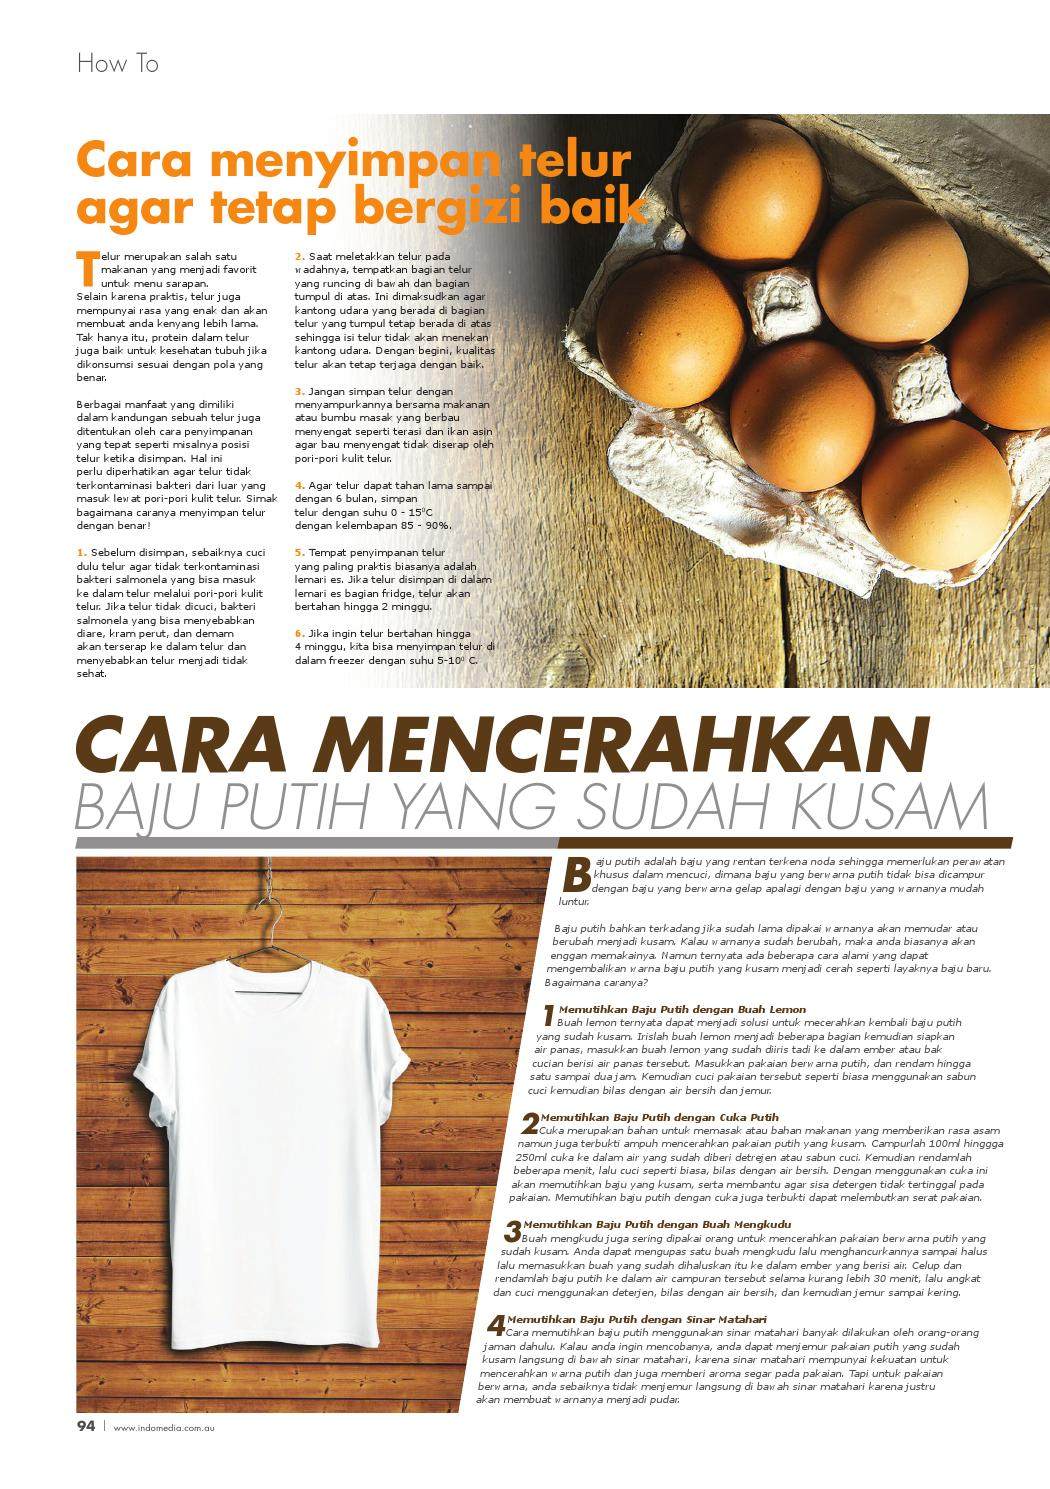 Cara Menyimpan Telur : menyimpan, telur, INDOMEDIA, FEBRUARY, Media, Issuu